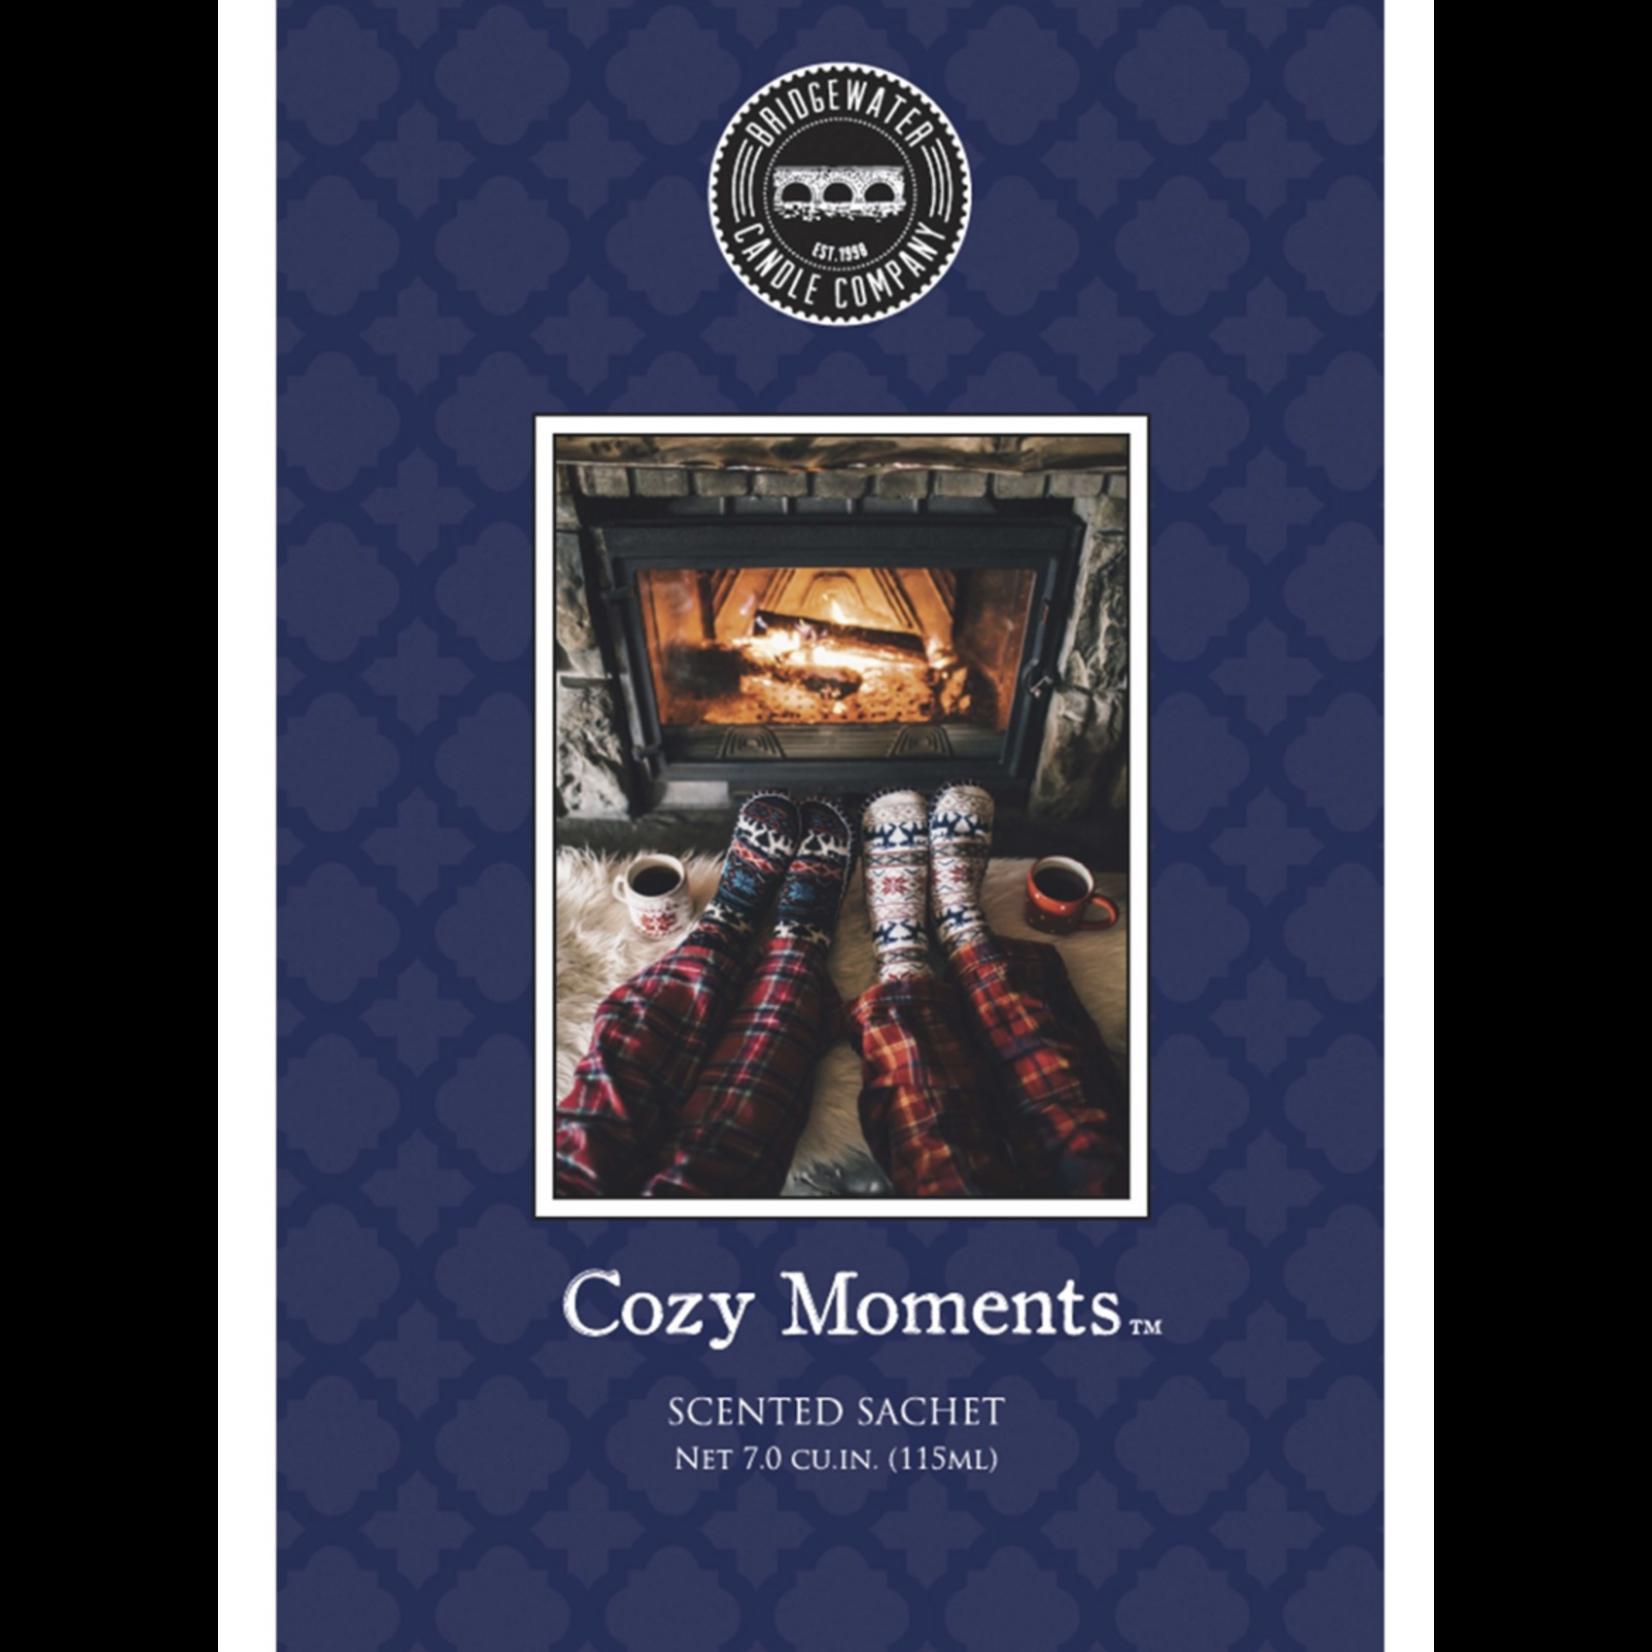 Bridgewater Scented Sachet / Geurzakje Cozy Moments